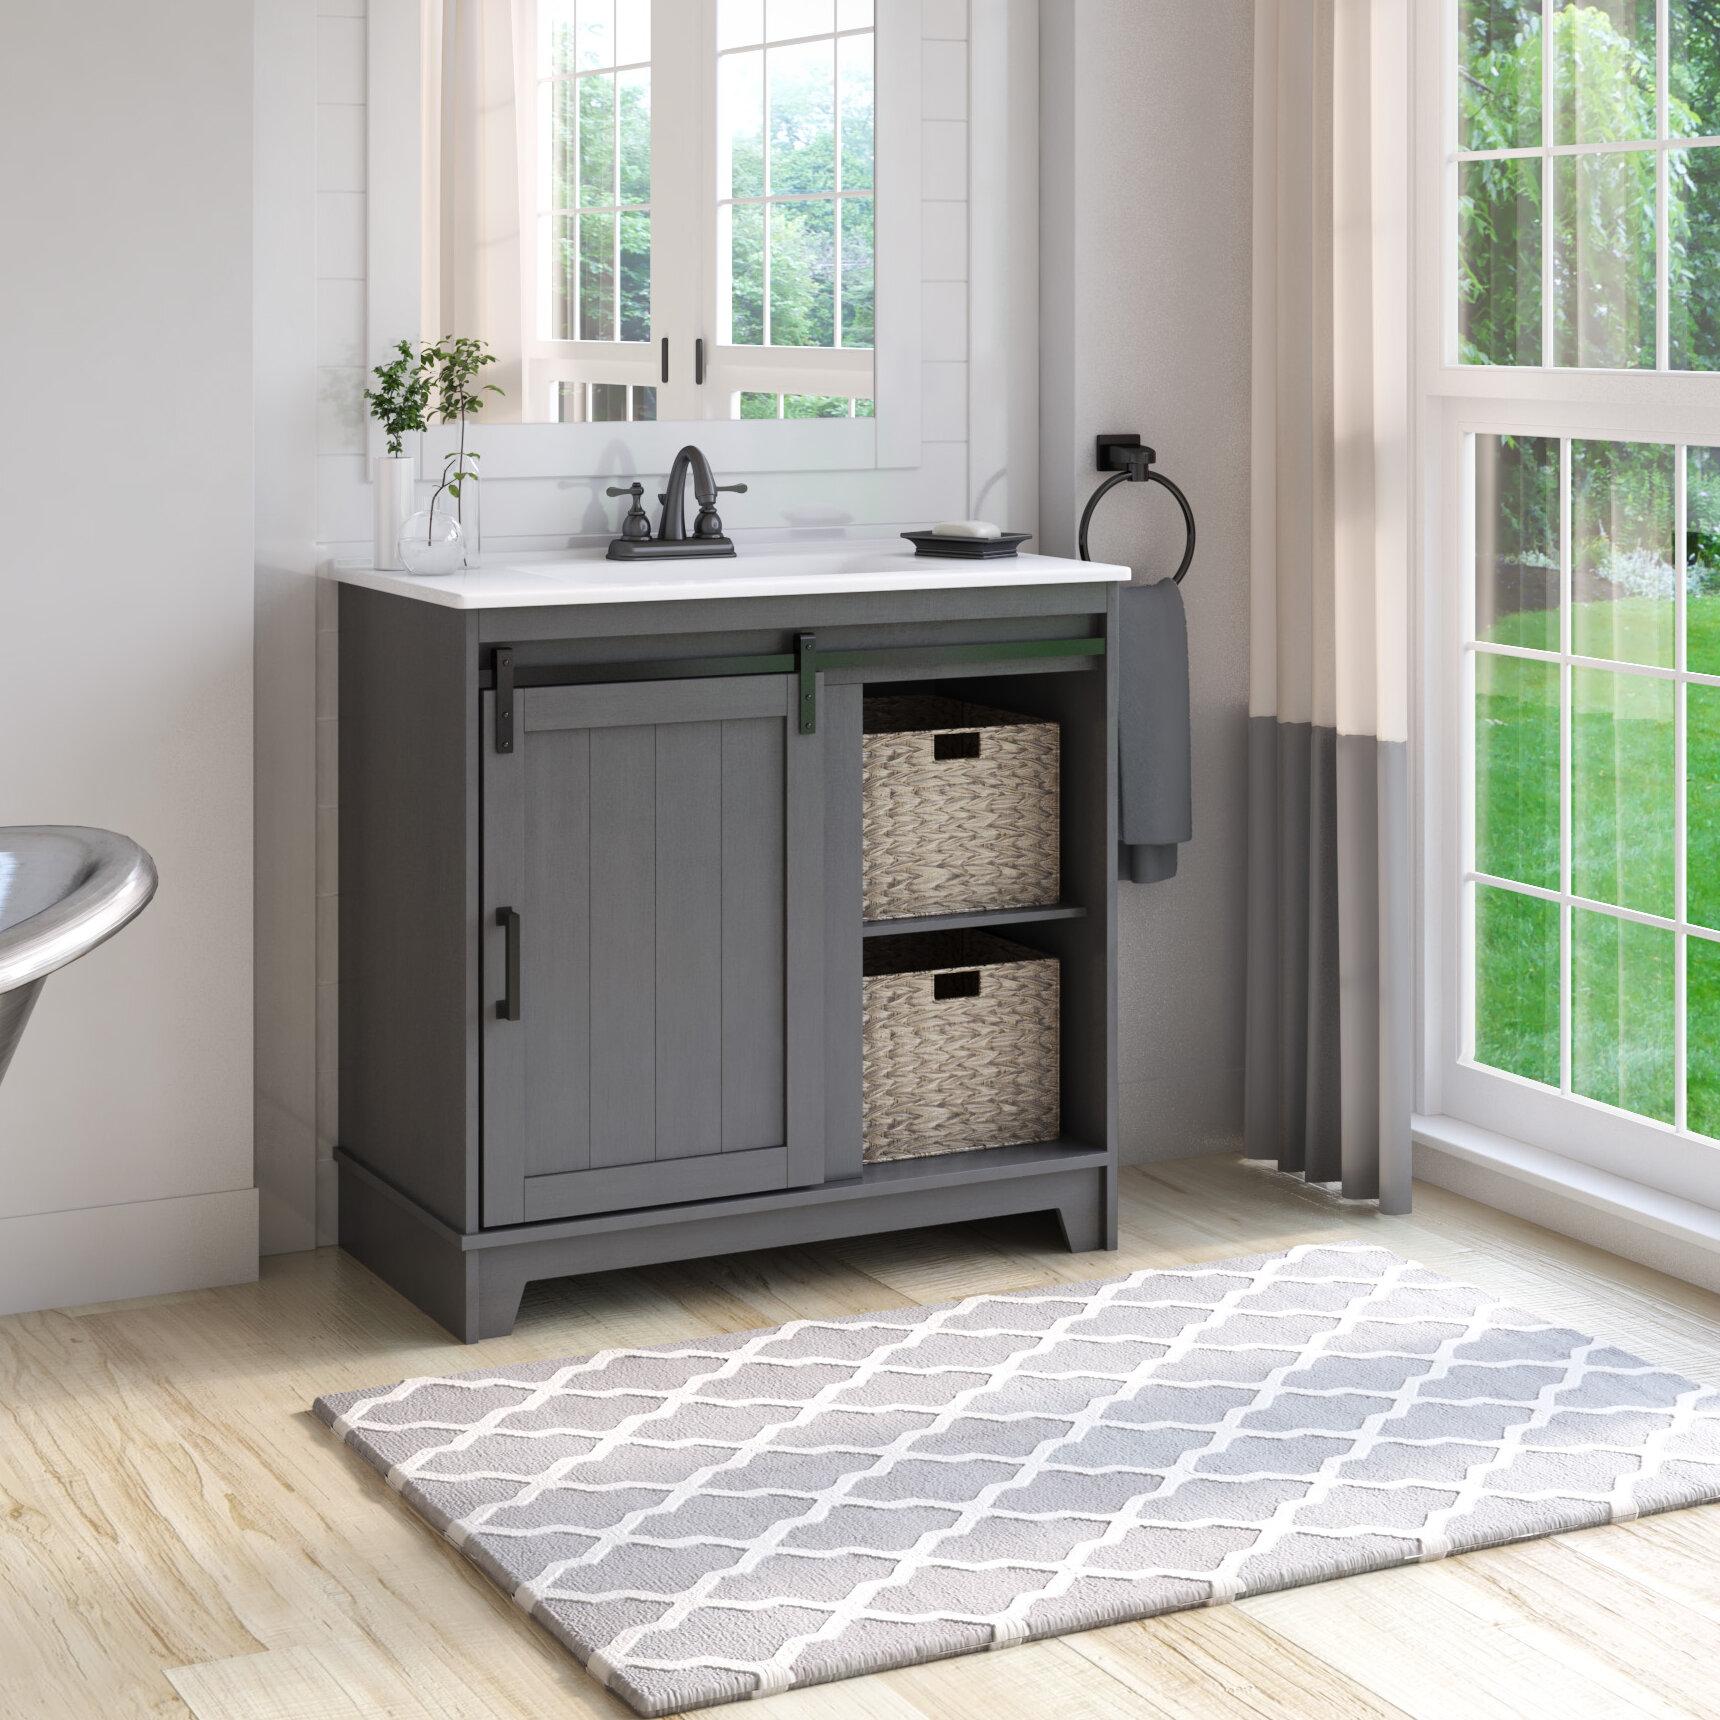 Wayfair Modern Farmhouse Bathroom Vanities You Ll Love In 2021